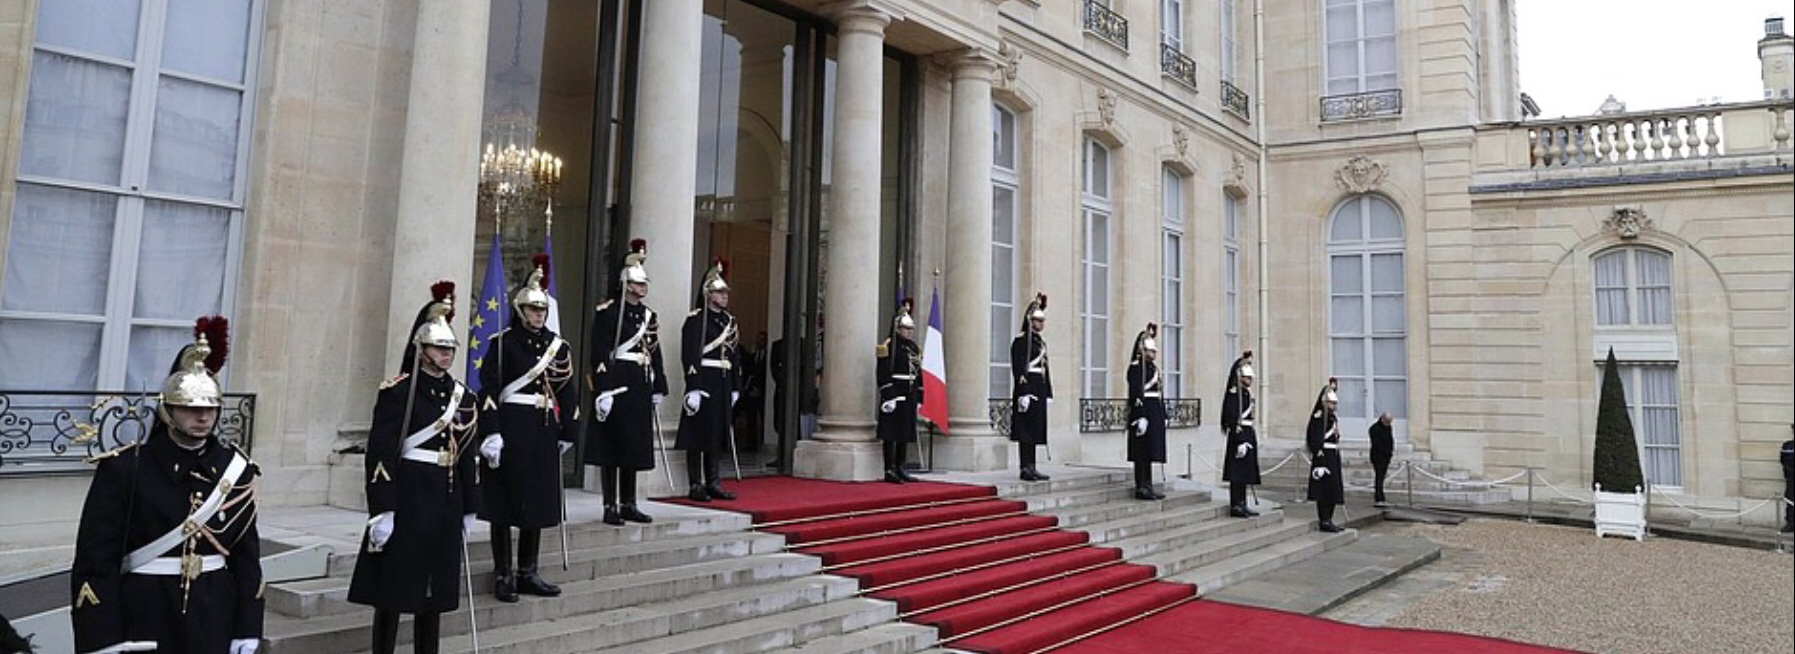 Macron hosts Normandy Summit